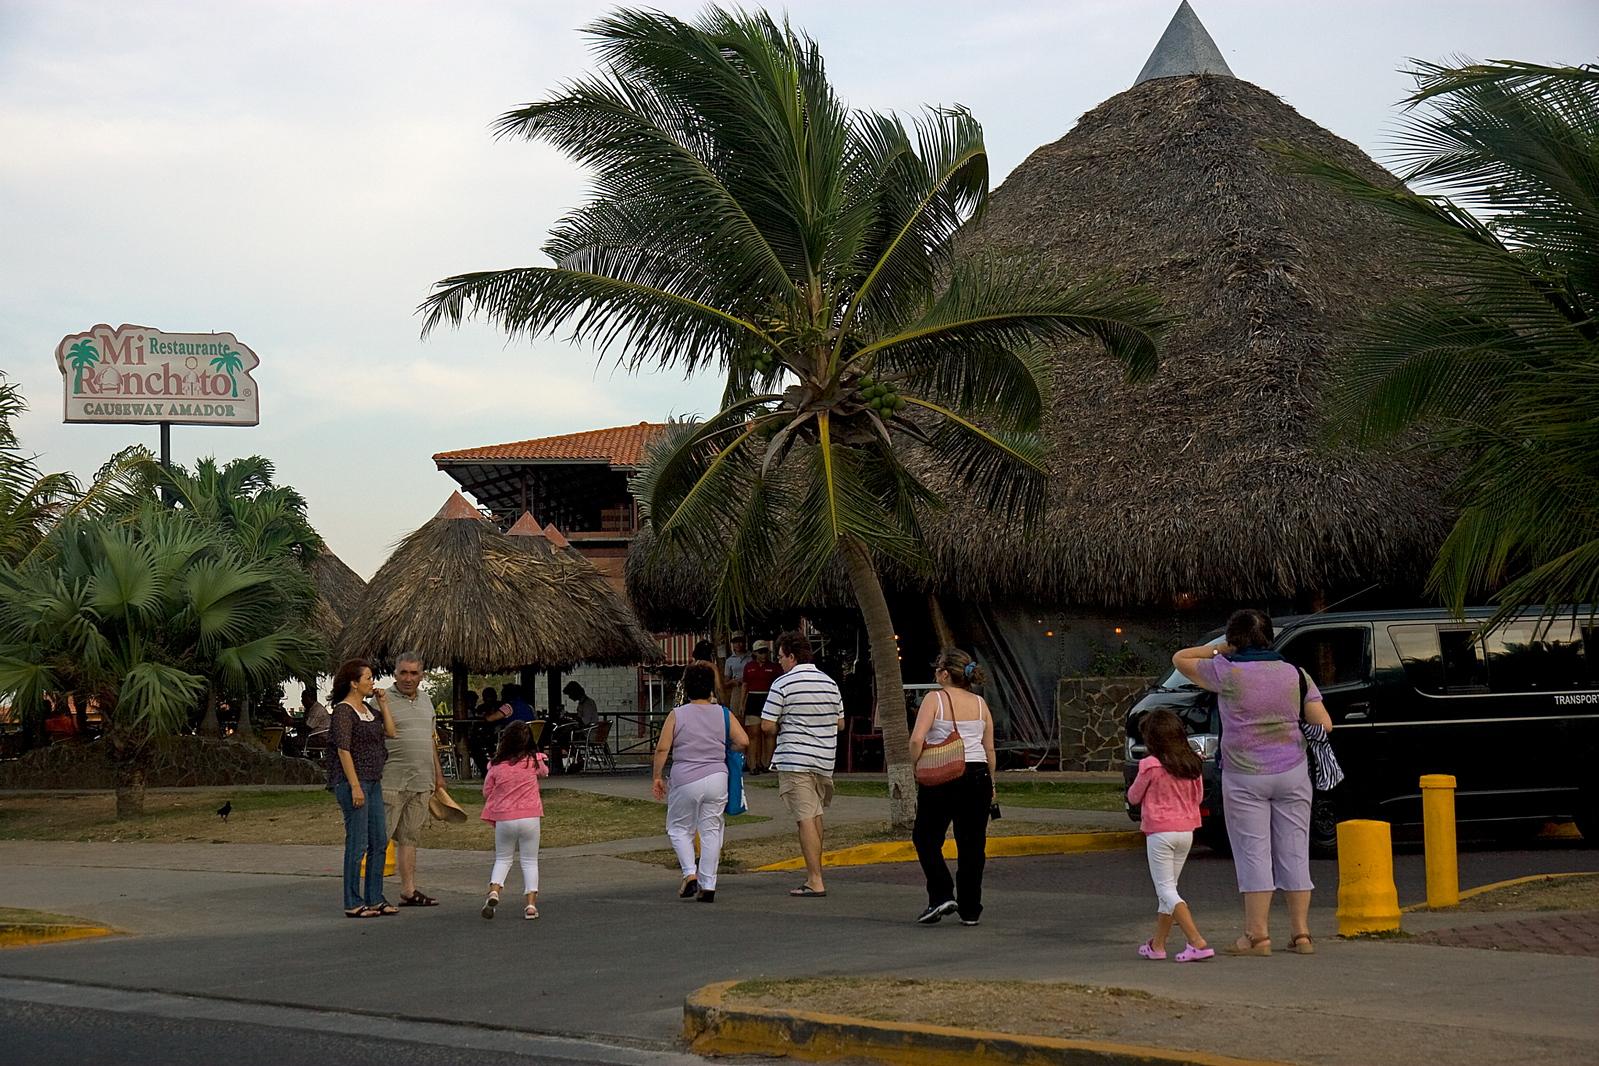 """Mi Ranchito restaurant good food on Amador Causeway"""